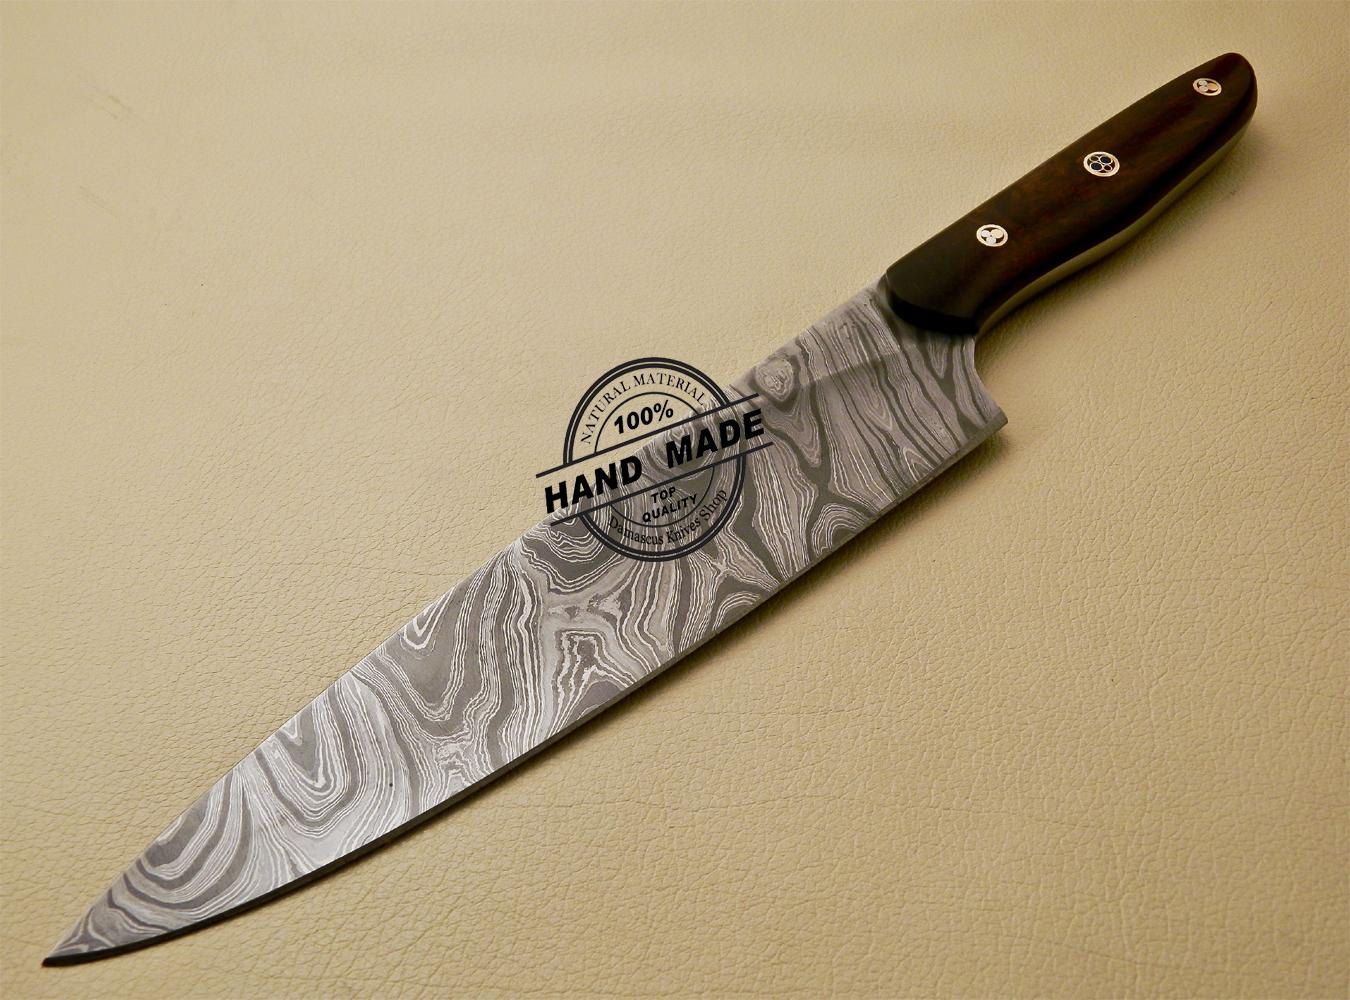 damascus kitchen knives damascus kitchen knife custom handmade damascus kitchen